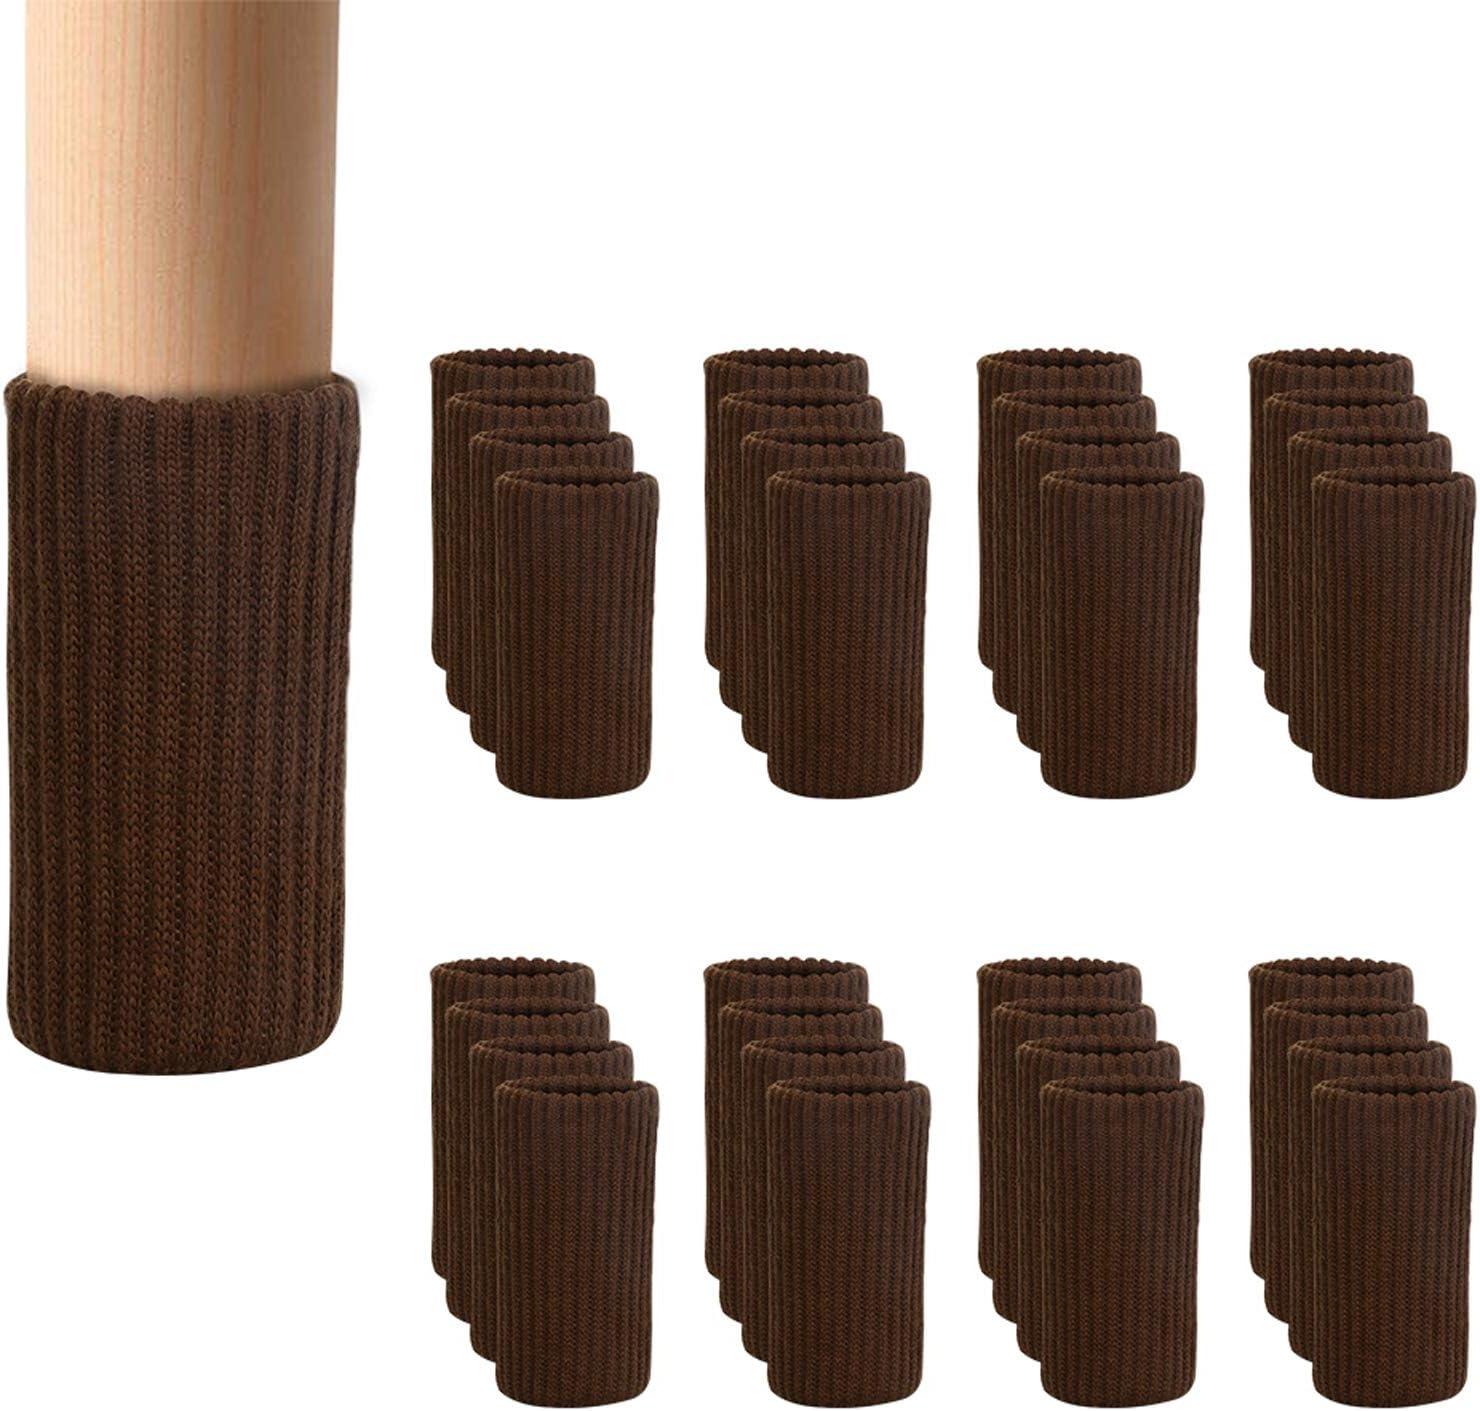 4PCS Chair Leg Cover Knitting Socks Floor Protector Furniture Table Feet Pads